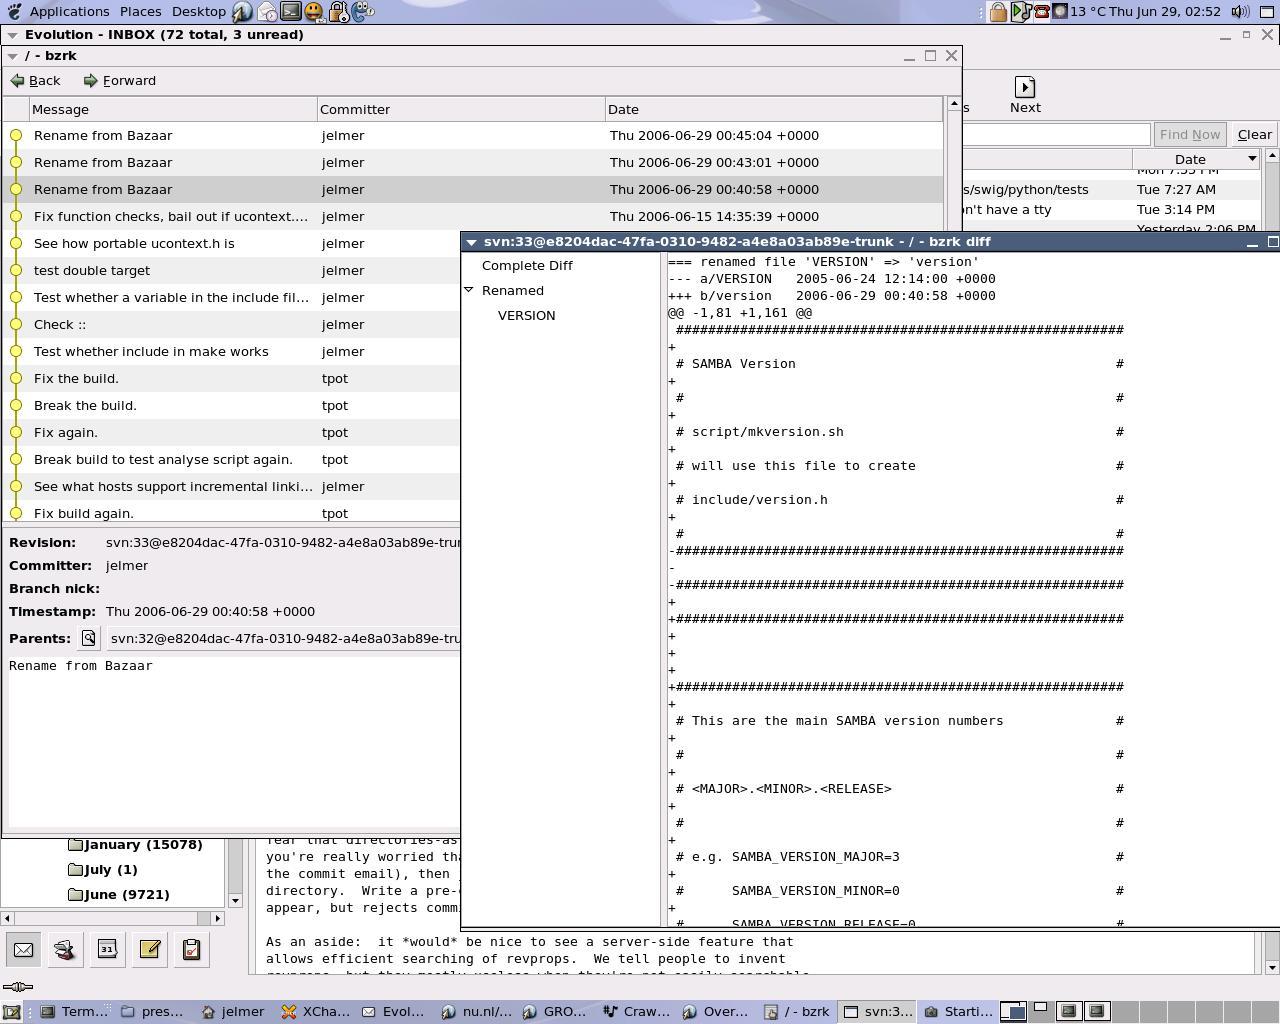 Linux文件共享套件 Samba 4.0.6